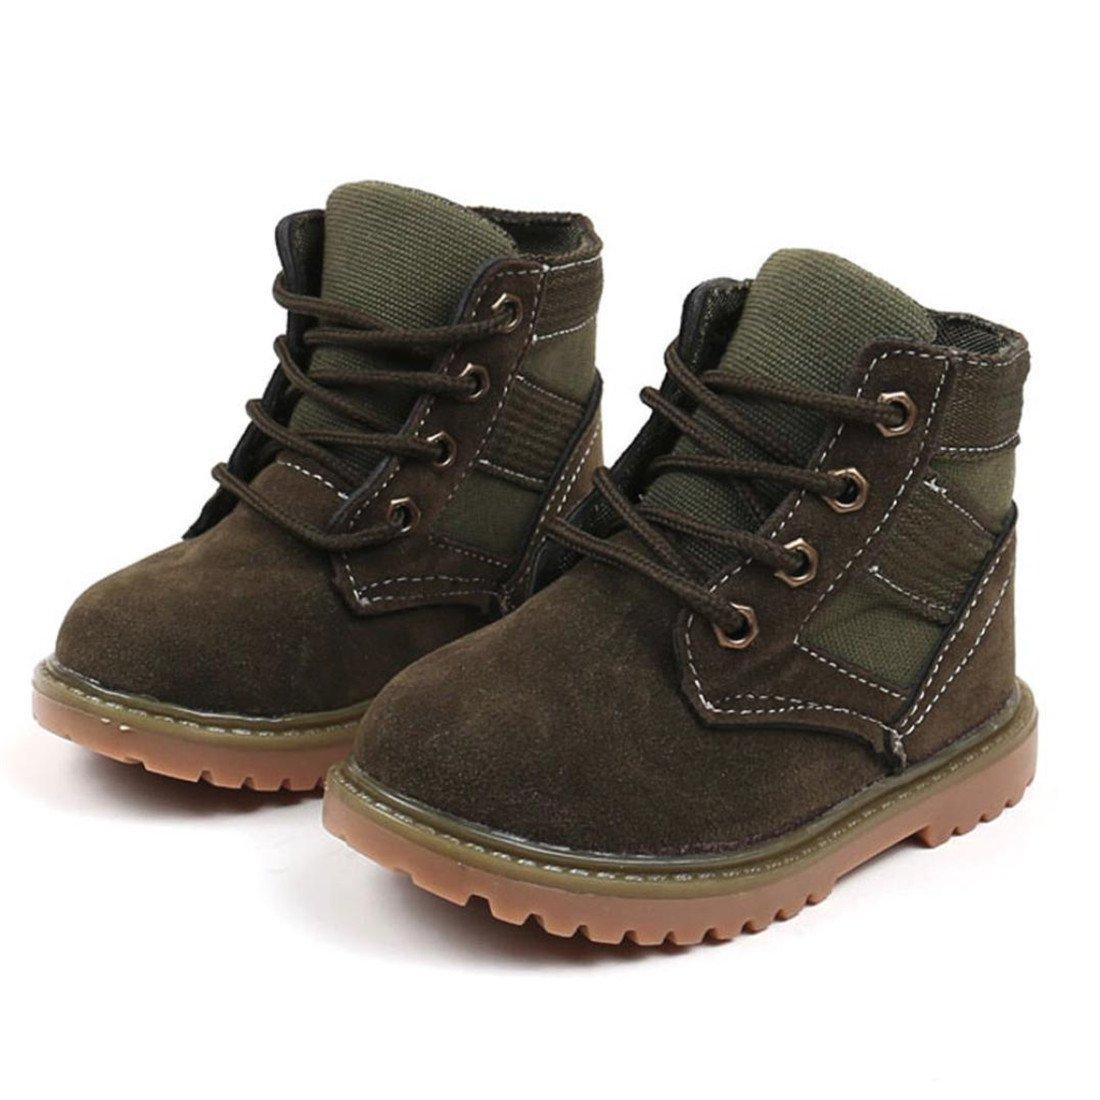 Btruely Kinder Sneaker Mode Baby Schuhe Winter Dick